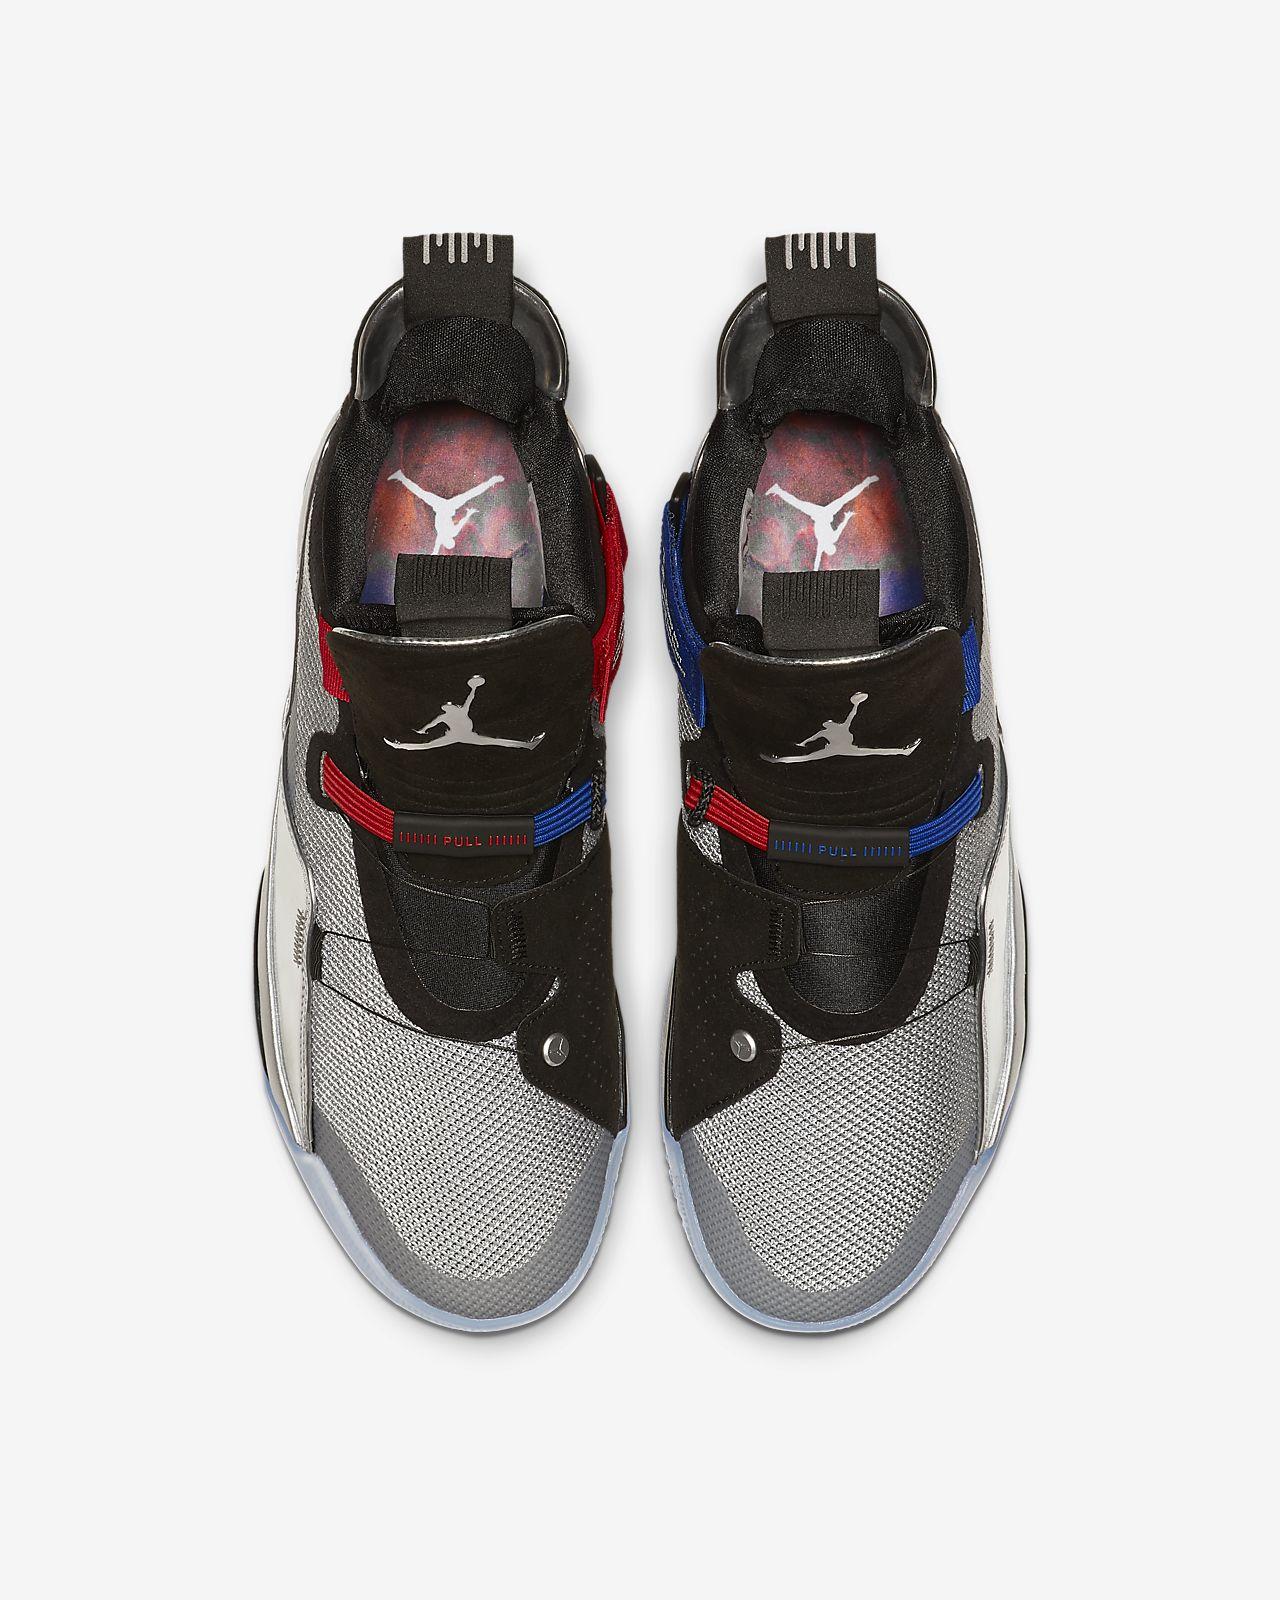 sale retailer d413b e10c6 ... Chaussure de basketball Air Jordan XXXIII pour Homme